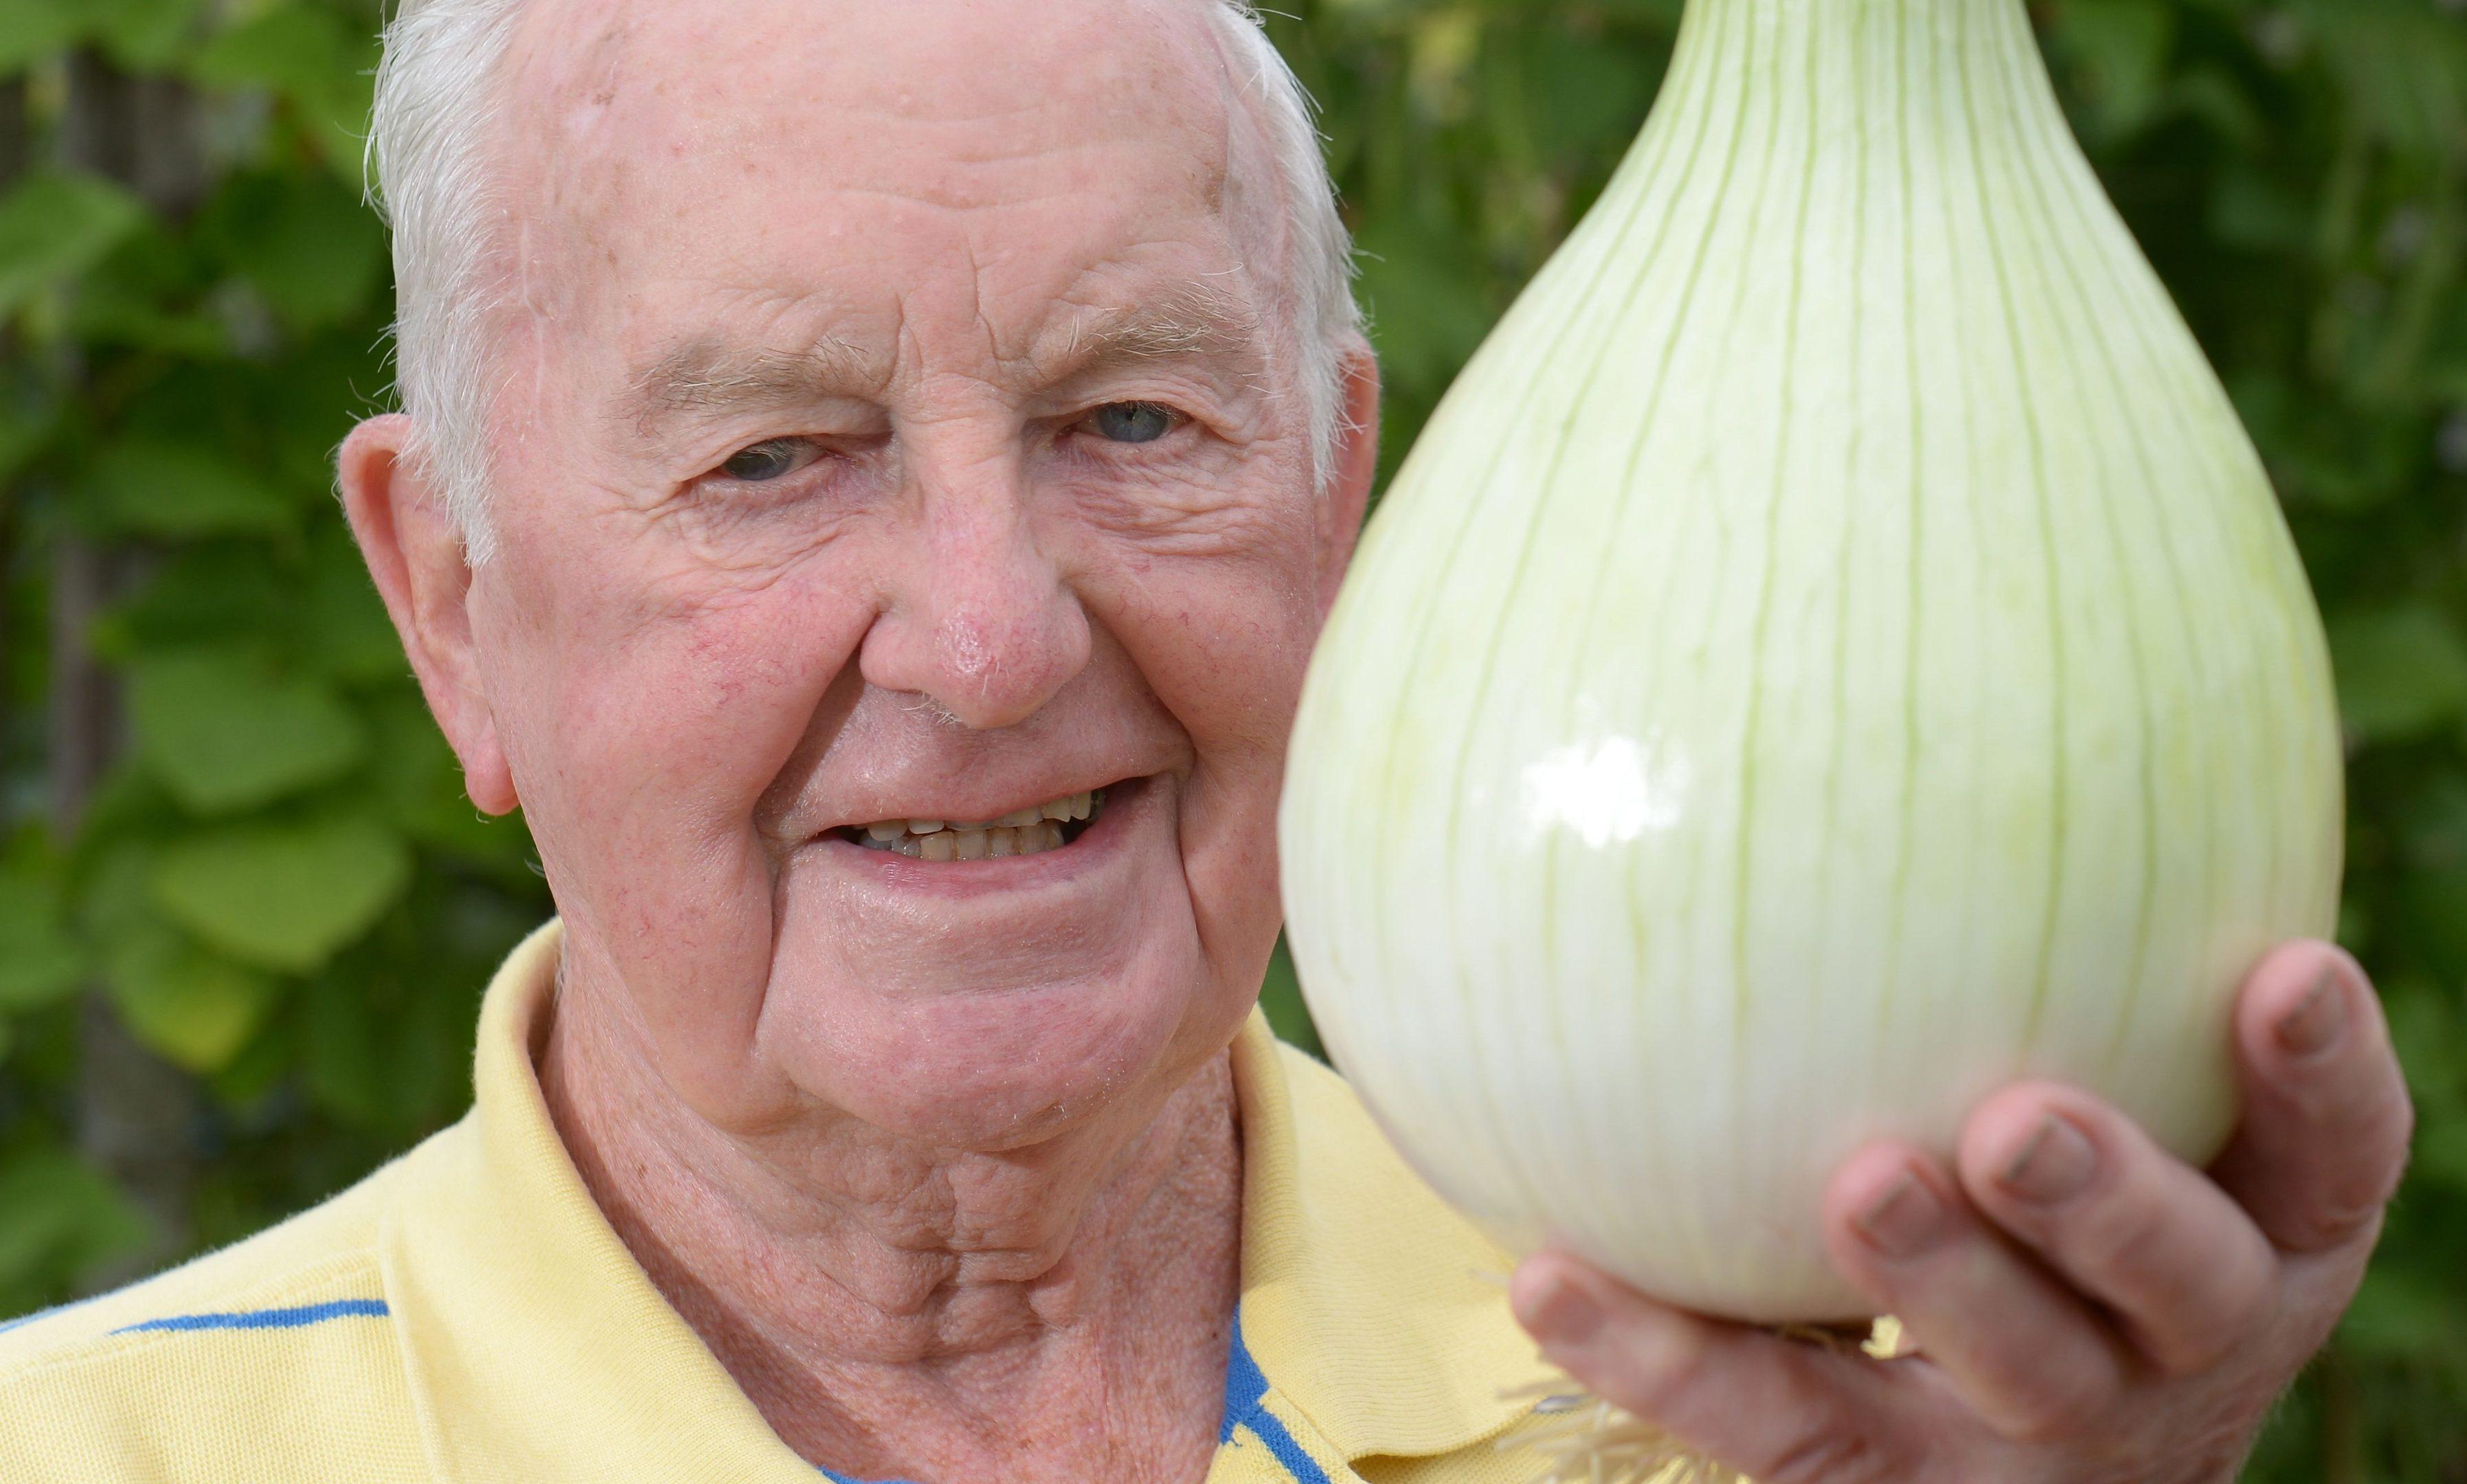 Jim Thomson grows the veg of champions.